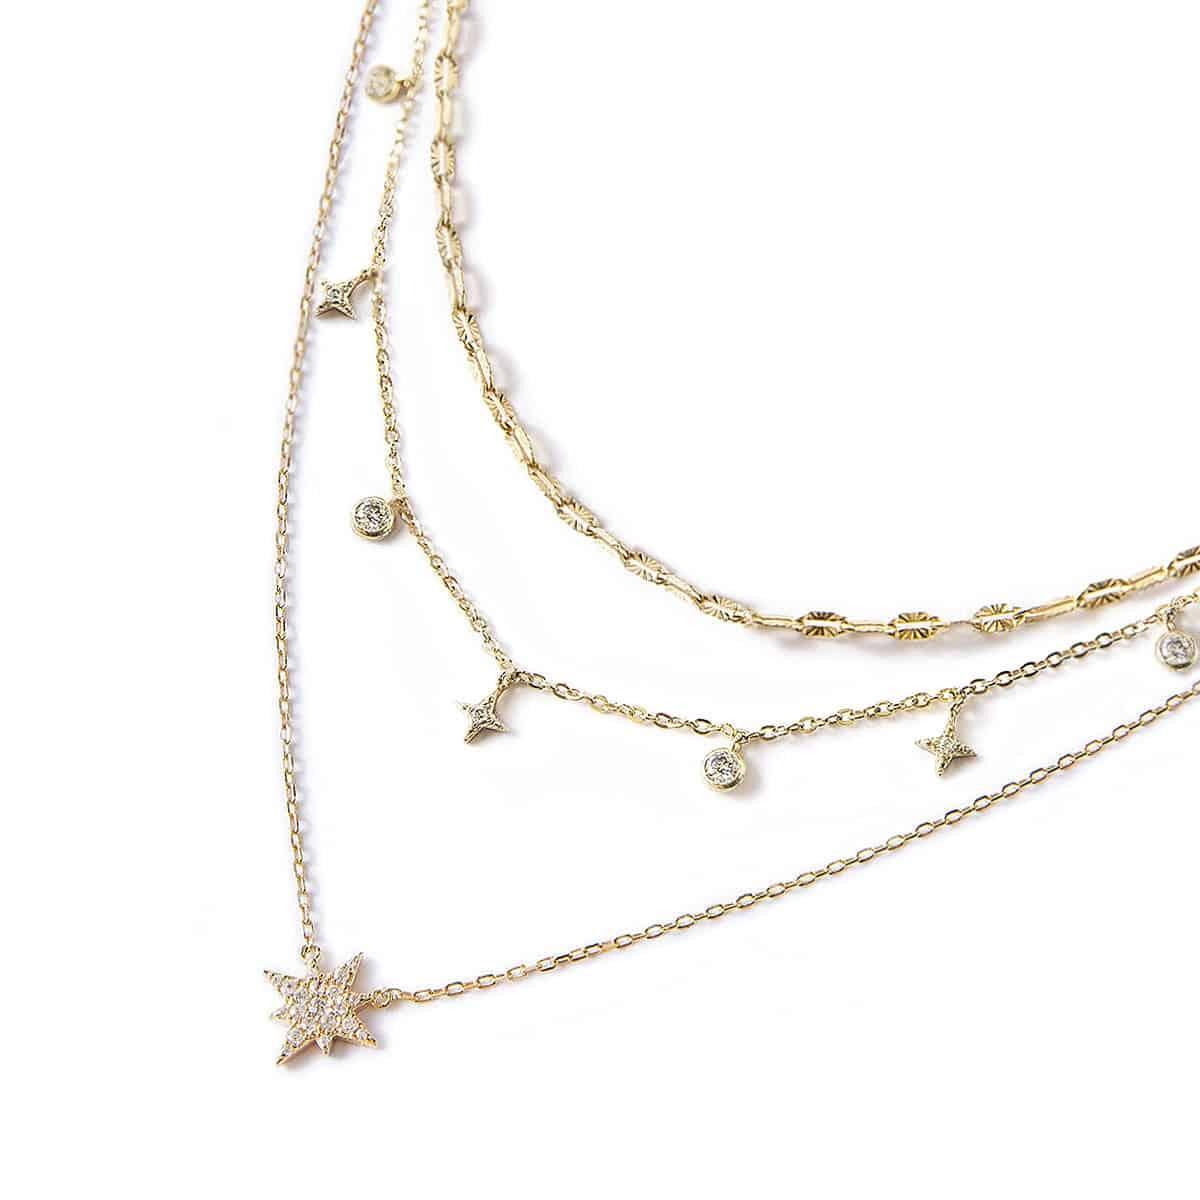 AMYO Jewelry